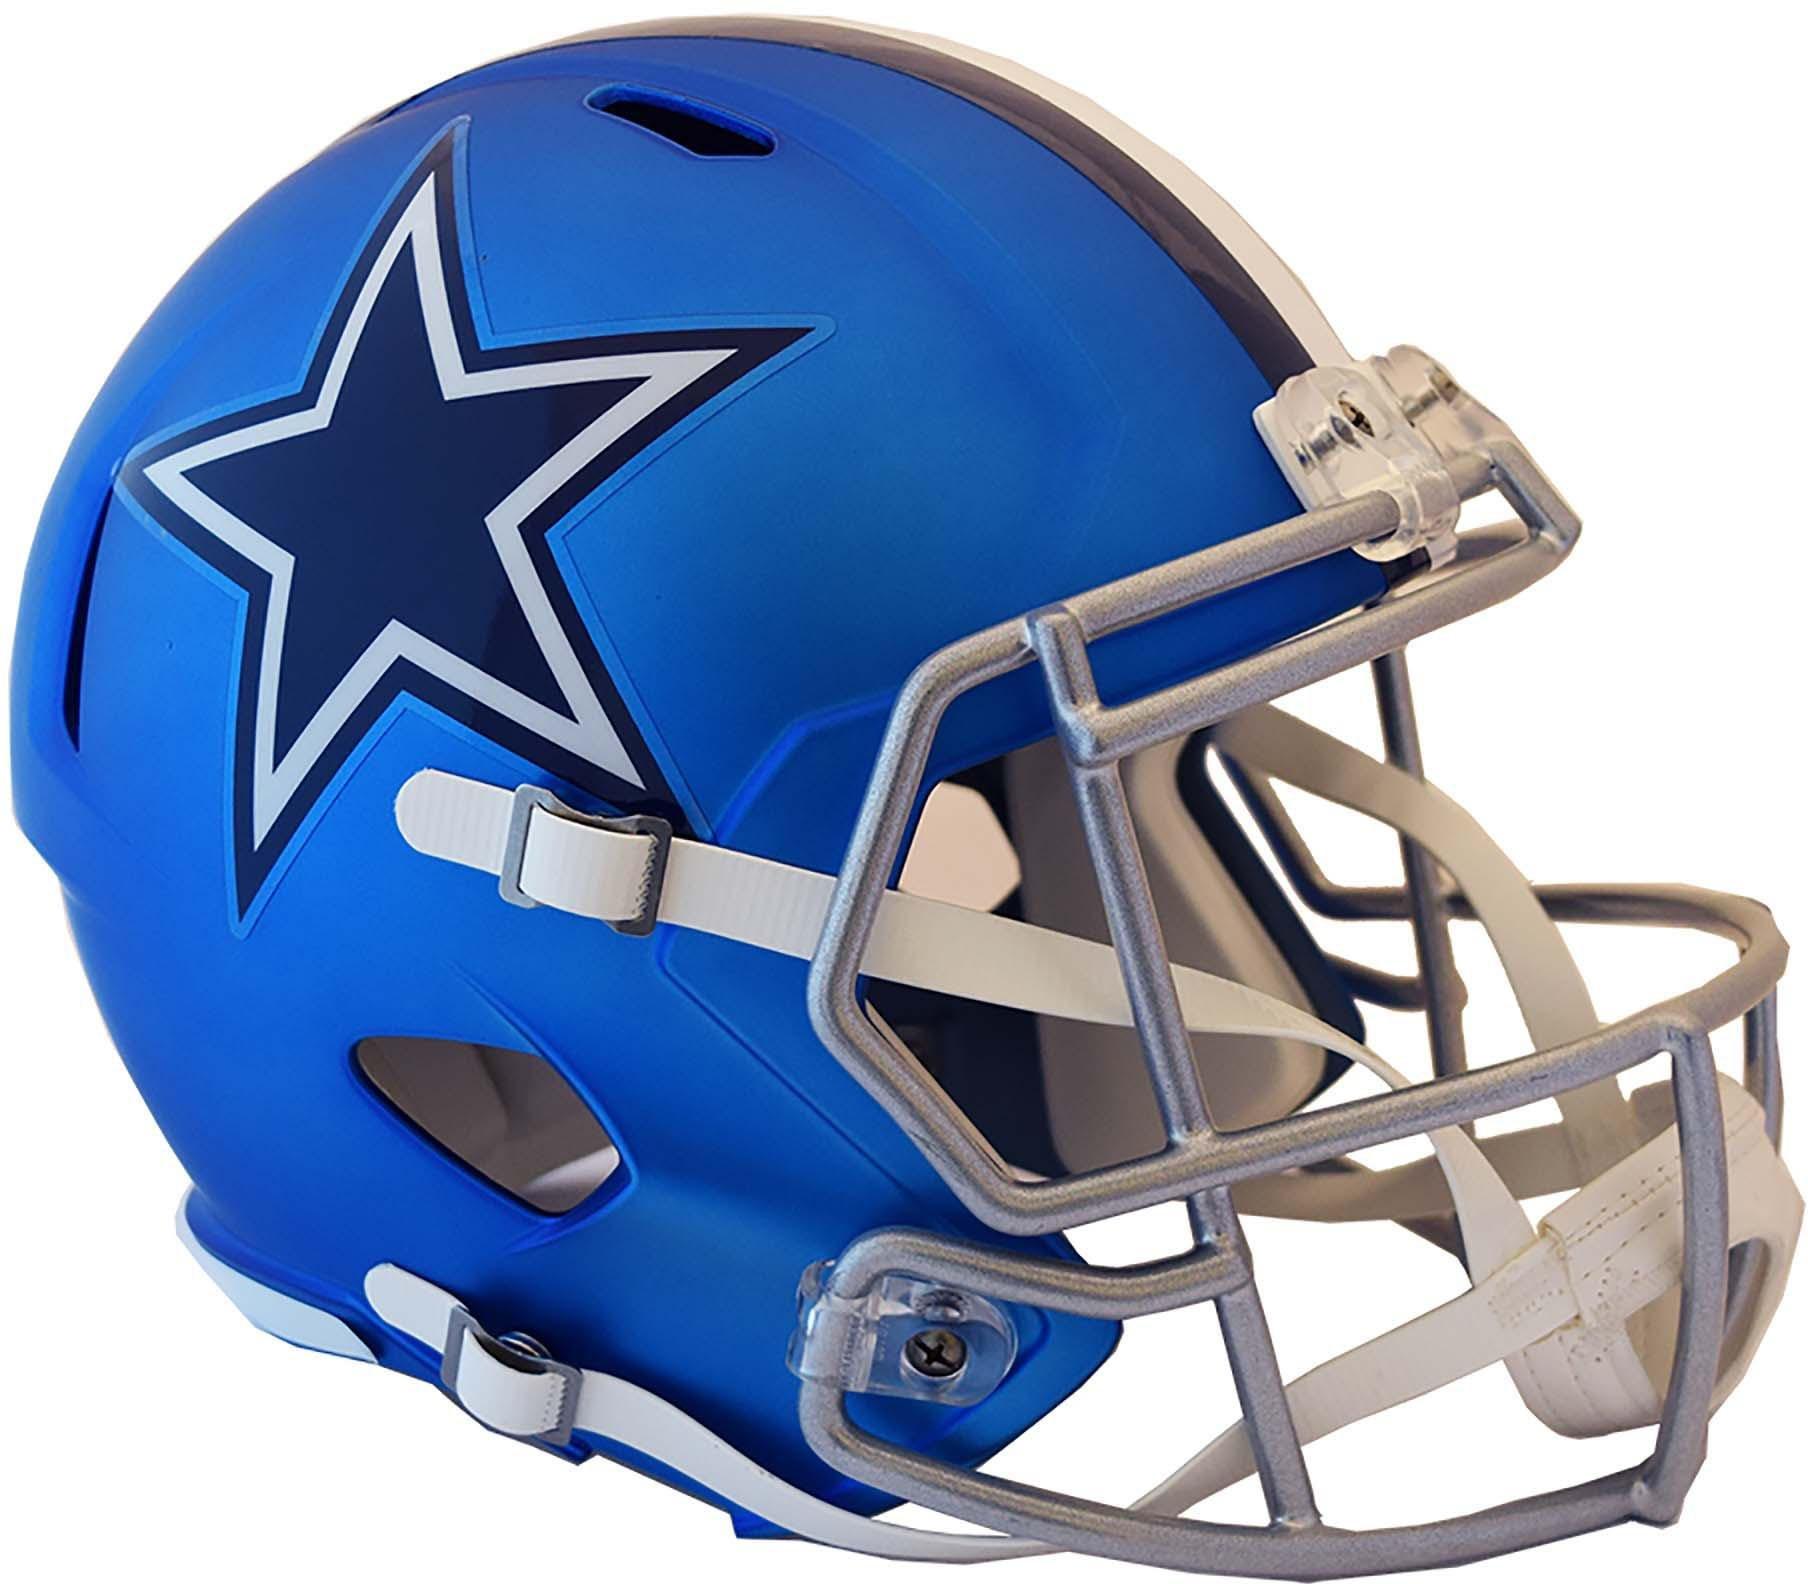 Riddell Dallas Cowboys Blaze Revolution Speed Full-Size Replica Football Helmet - Fanatics Authentic Certified